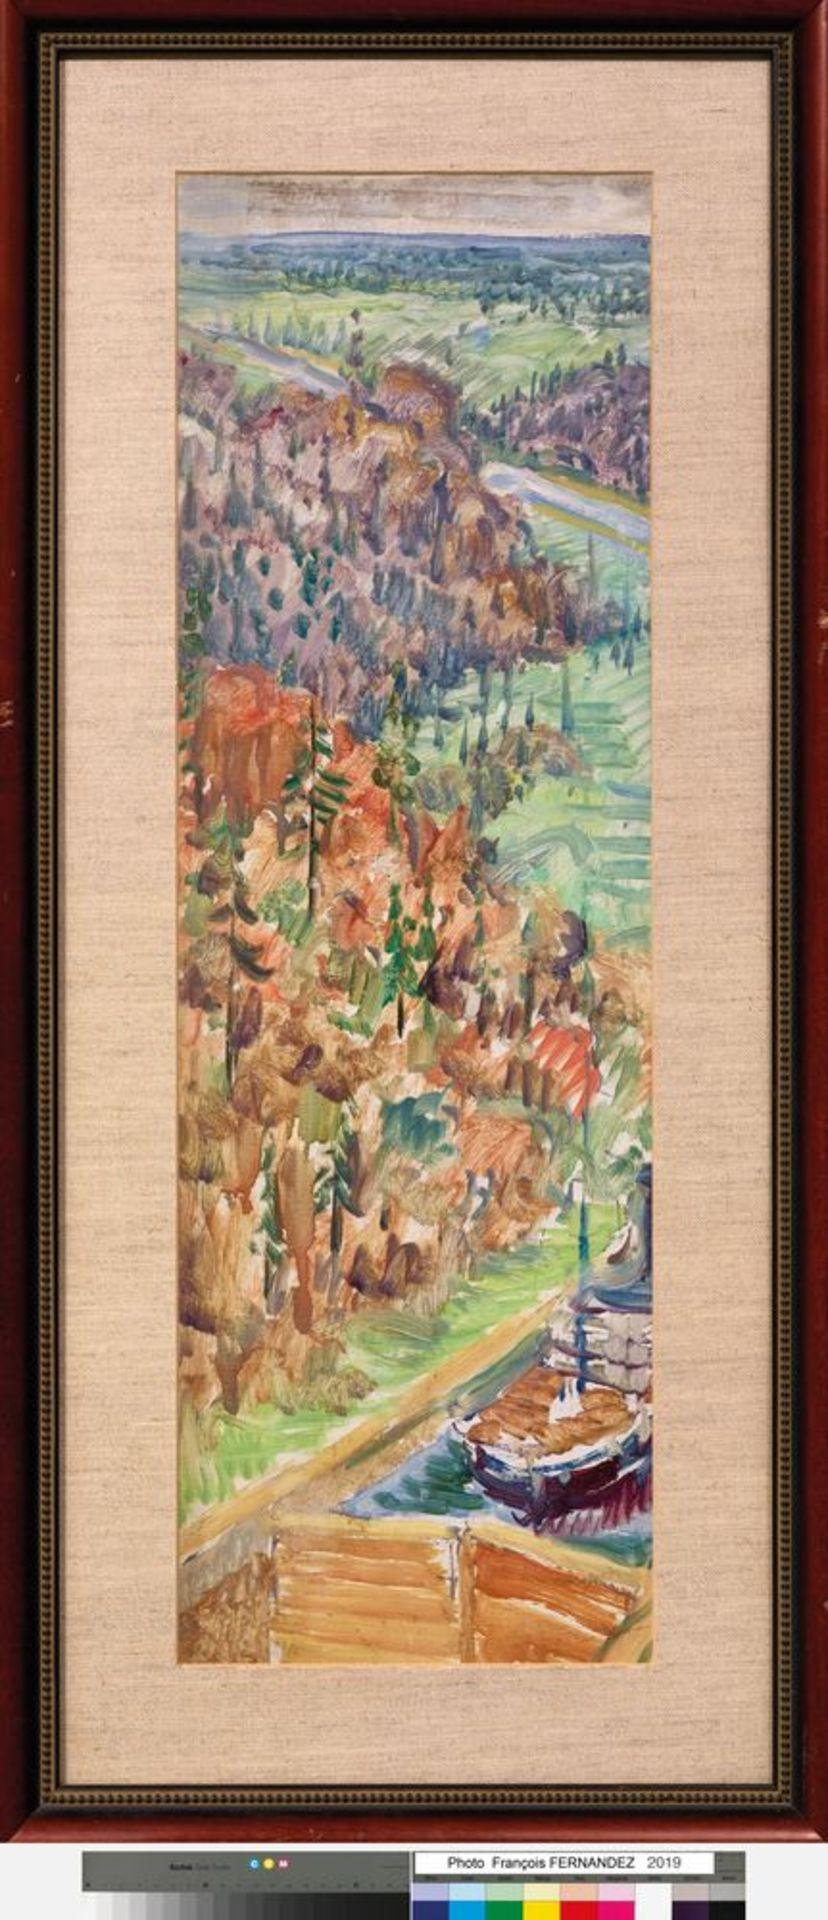 Los 26 - ILYA I. MASHKOV (1881-1944) - Moscow-Volga Canal. 1935. Oil on cardboard 73 x 26.5 [...]